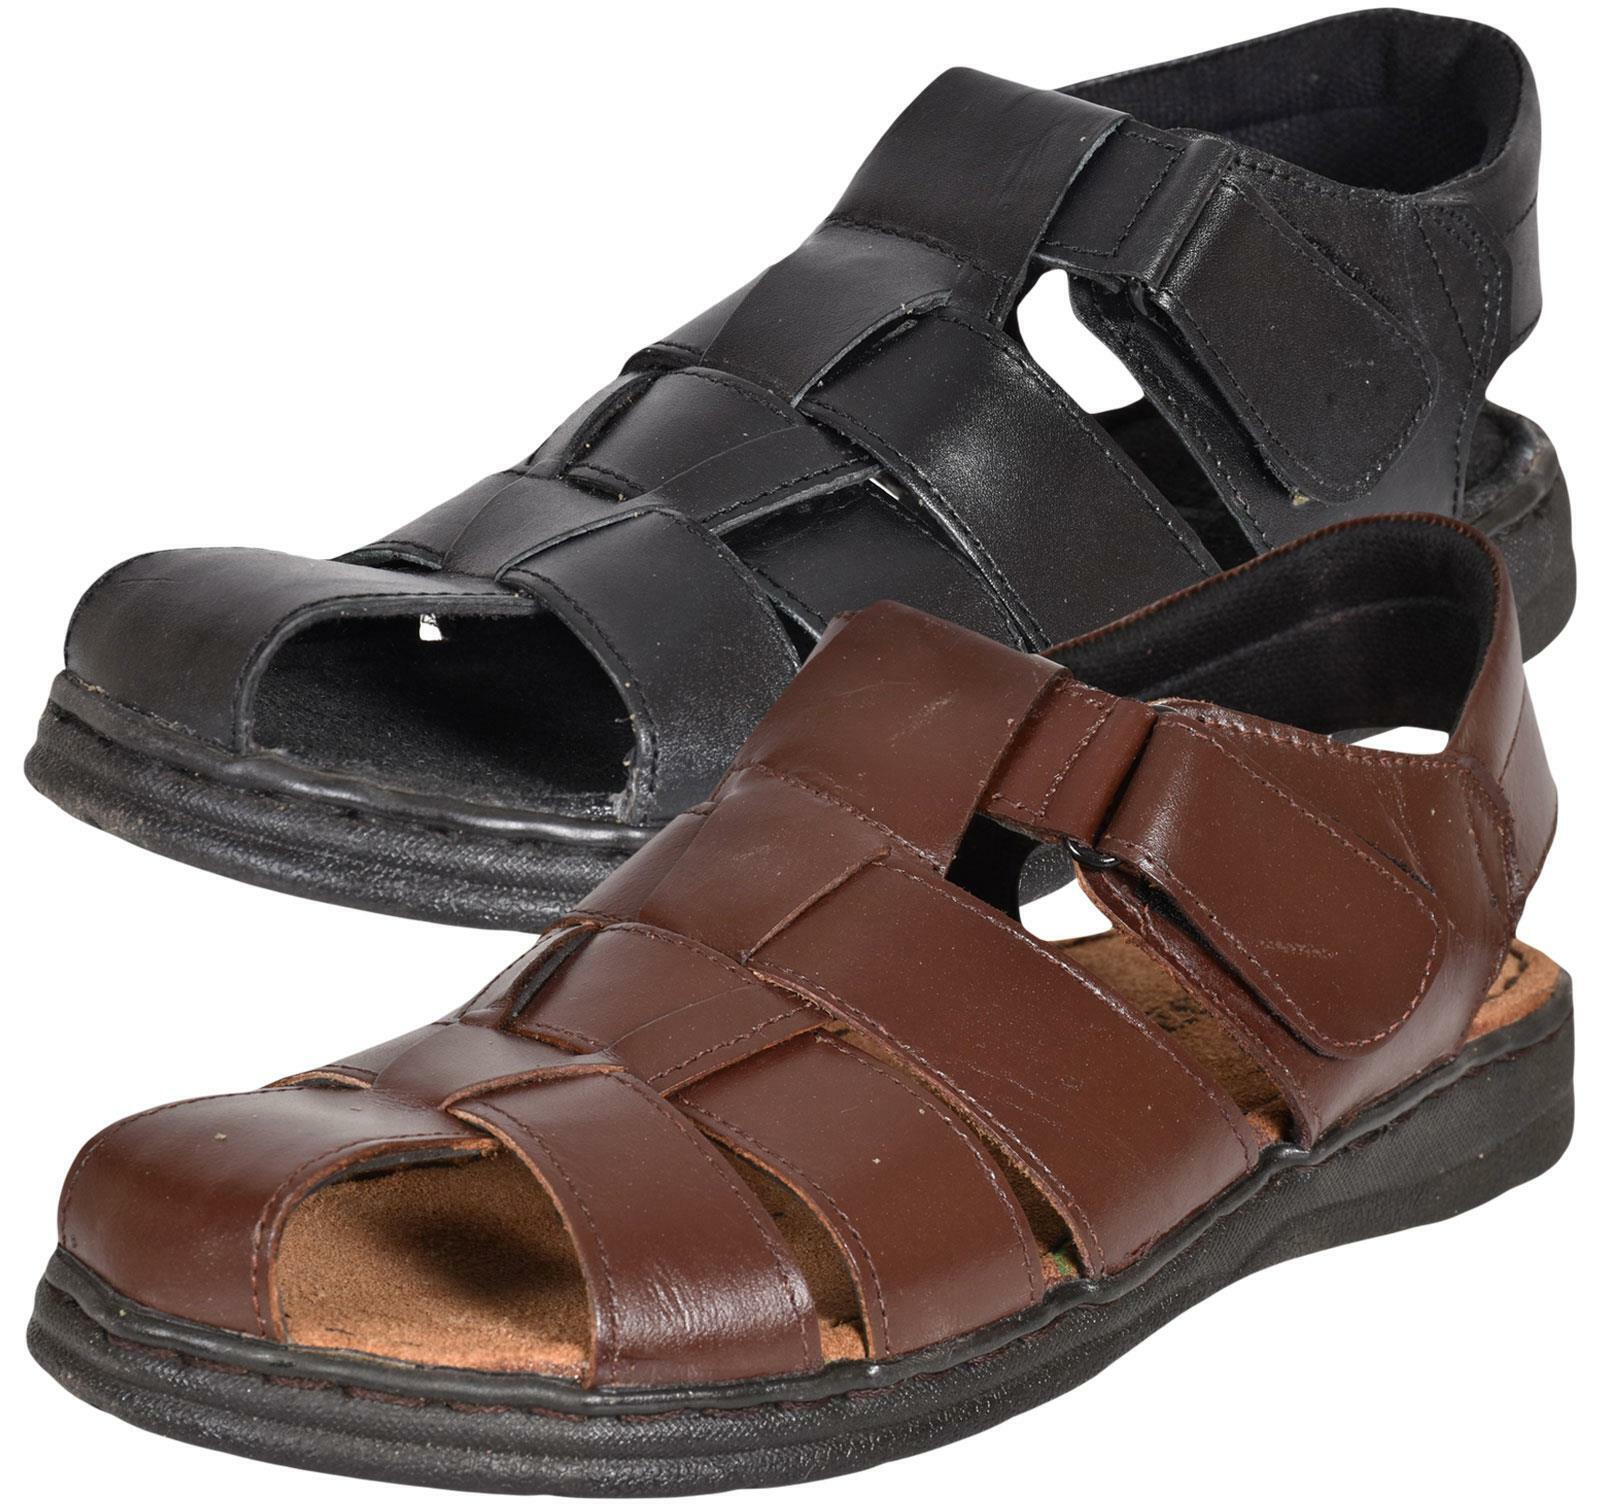 MOZAX Mens Sports Sandal Leather Close toe Casual Hiking Walk Trail UK Size 7-12